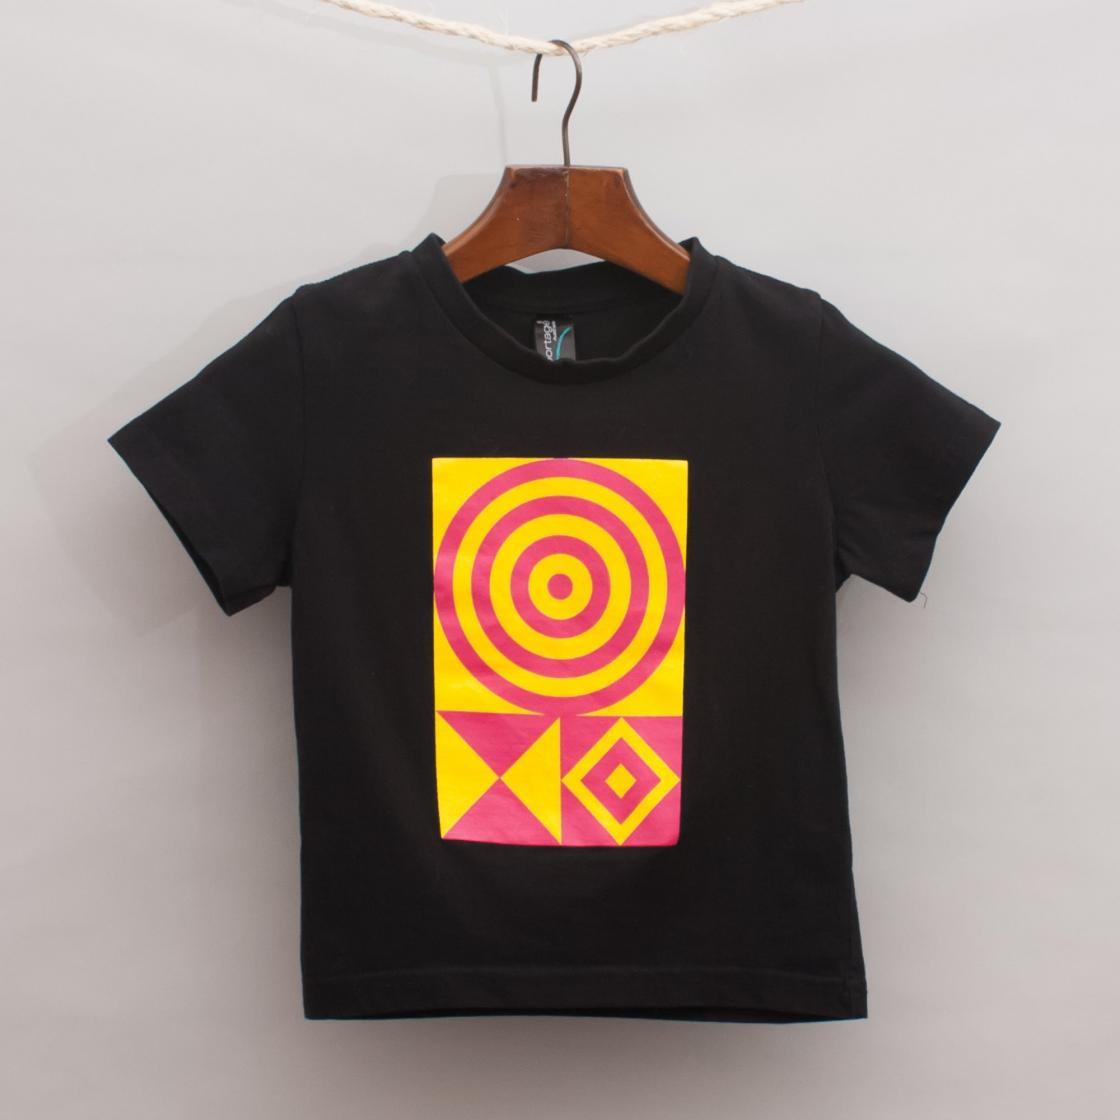 Sportage Black T-Shirt